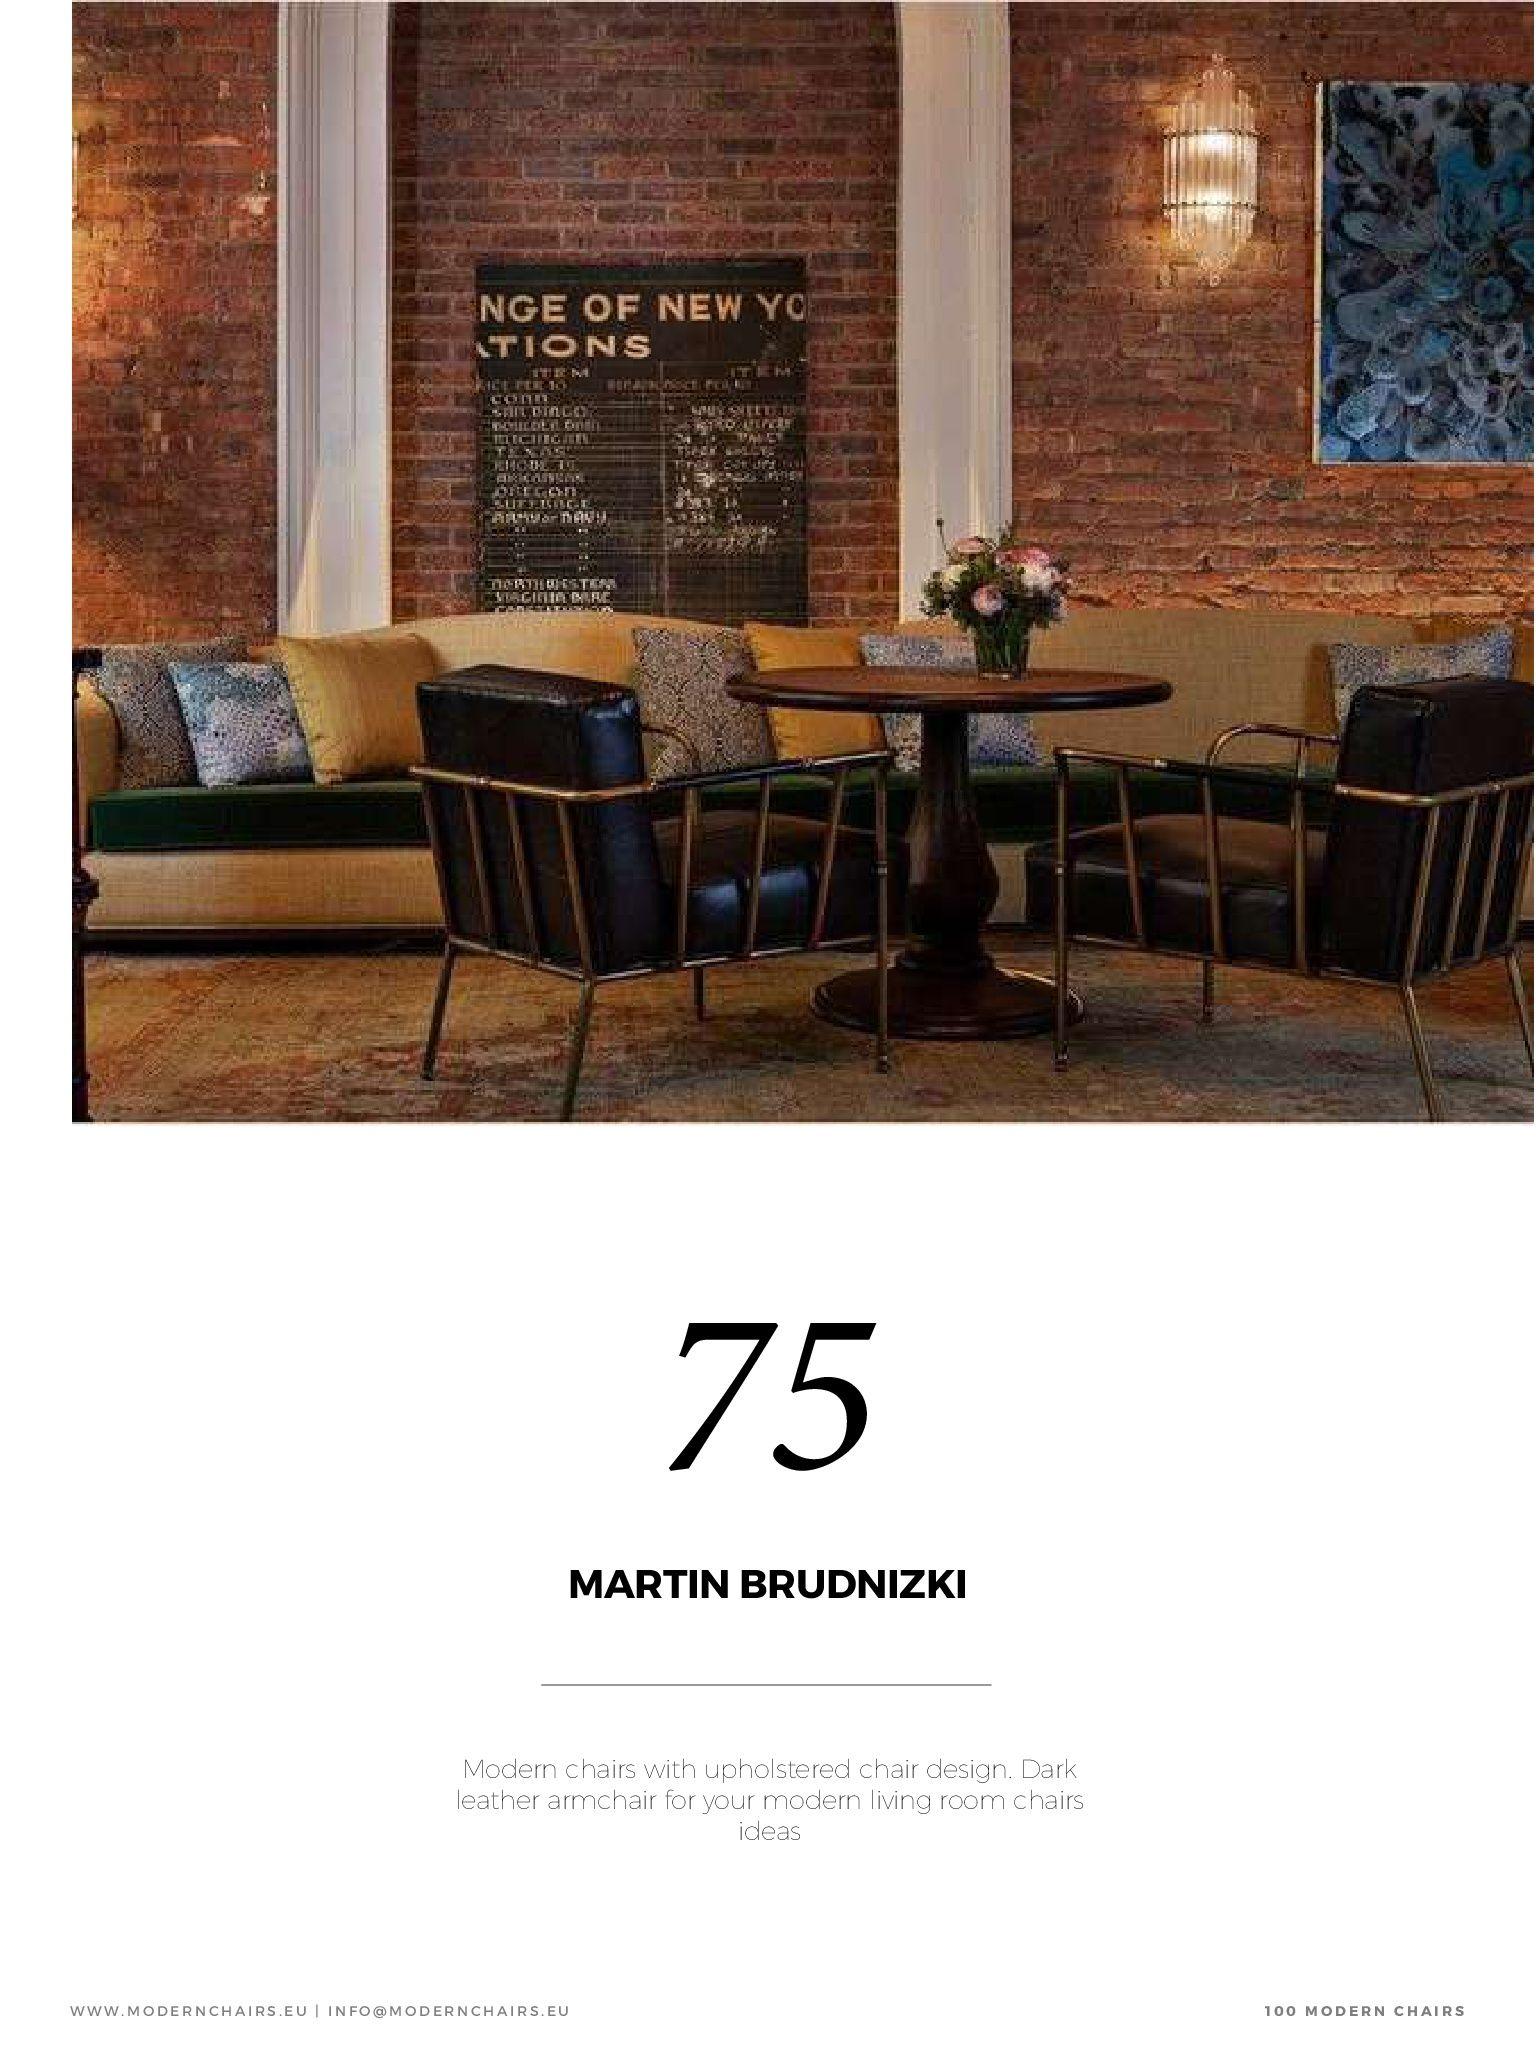 Sedie moderne Blog presenta 100 idee di sedie moderne. Qui troverete sedie imbottite, sedie in pelle e sedie da pranzo in pelle, sedie da soggiorno, poltrone girevoli e sedie da ufficio.